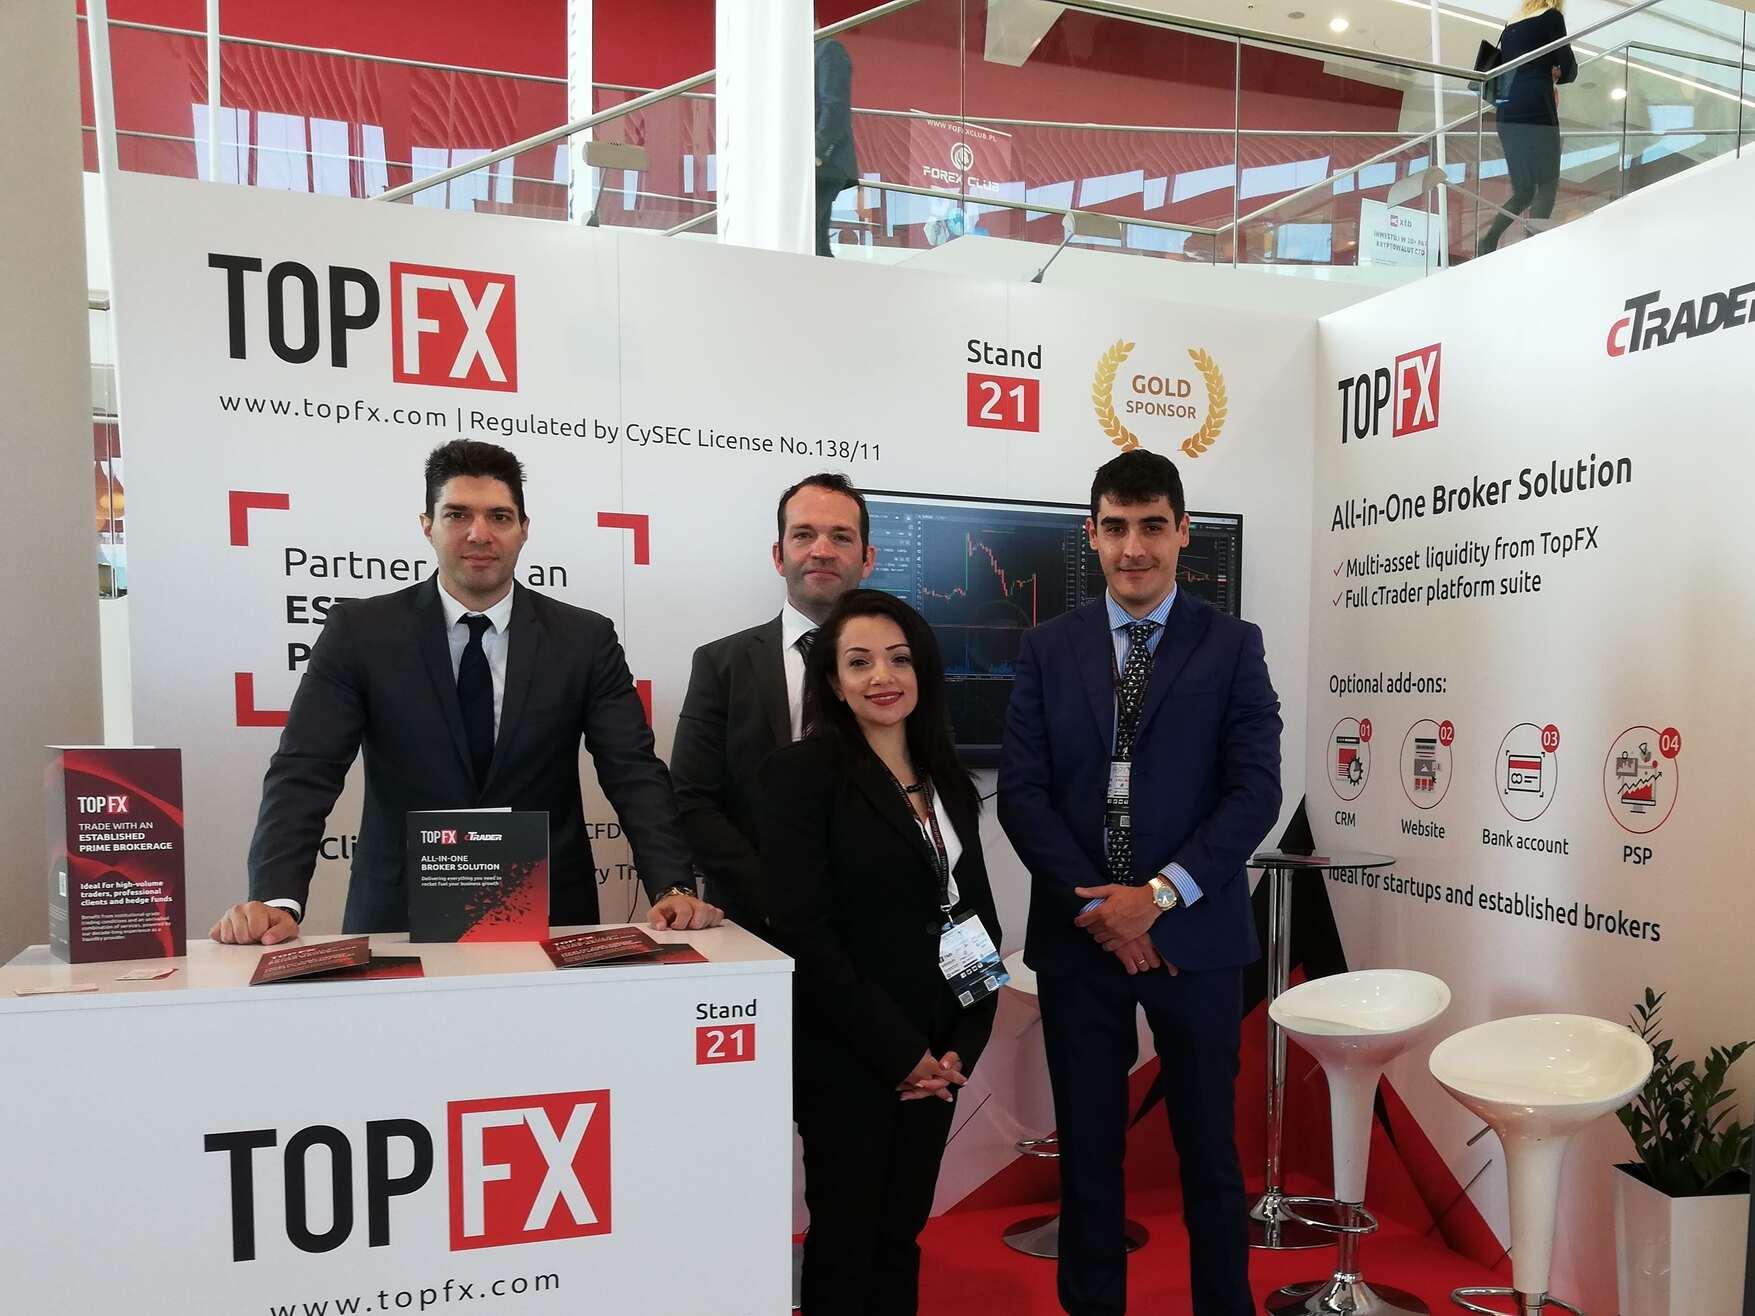 TopFX attends Invest Cuffs 2019-The team